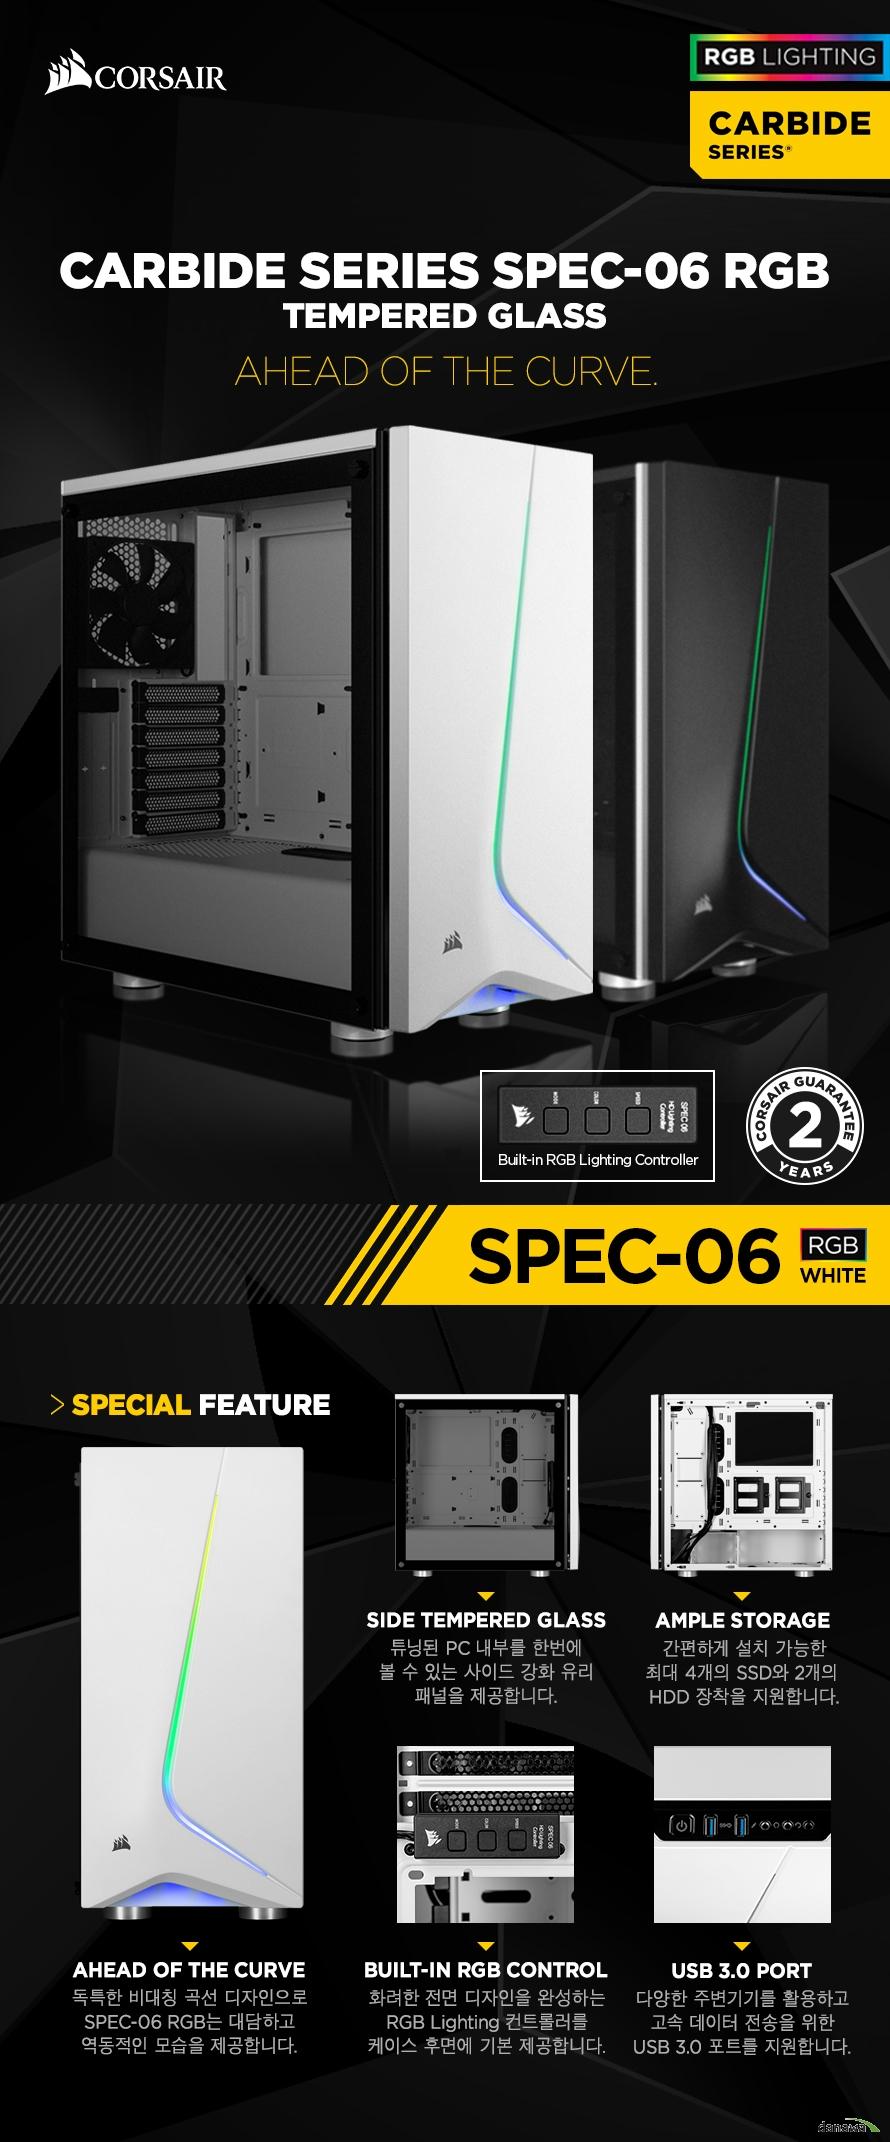 CORSAIR CARBIDE SERIES SPEC-06 RGB WHITE